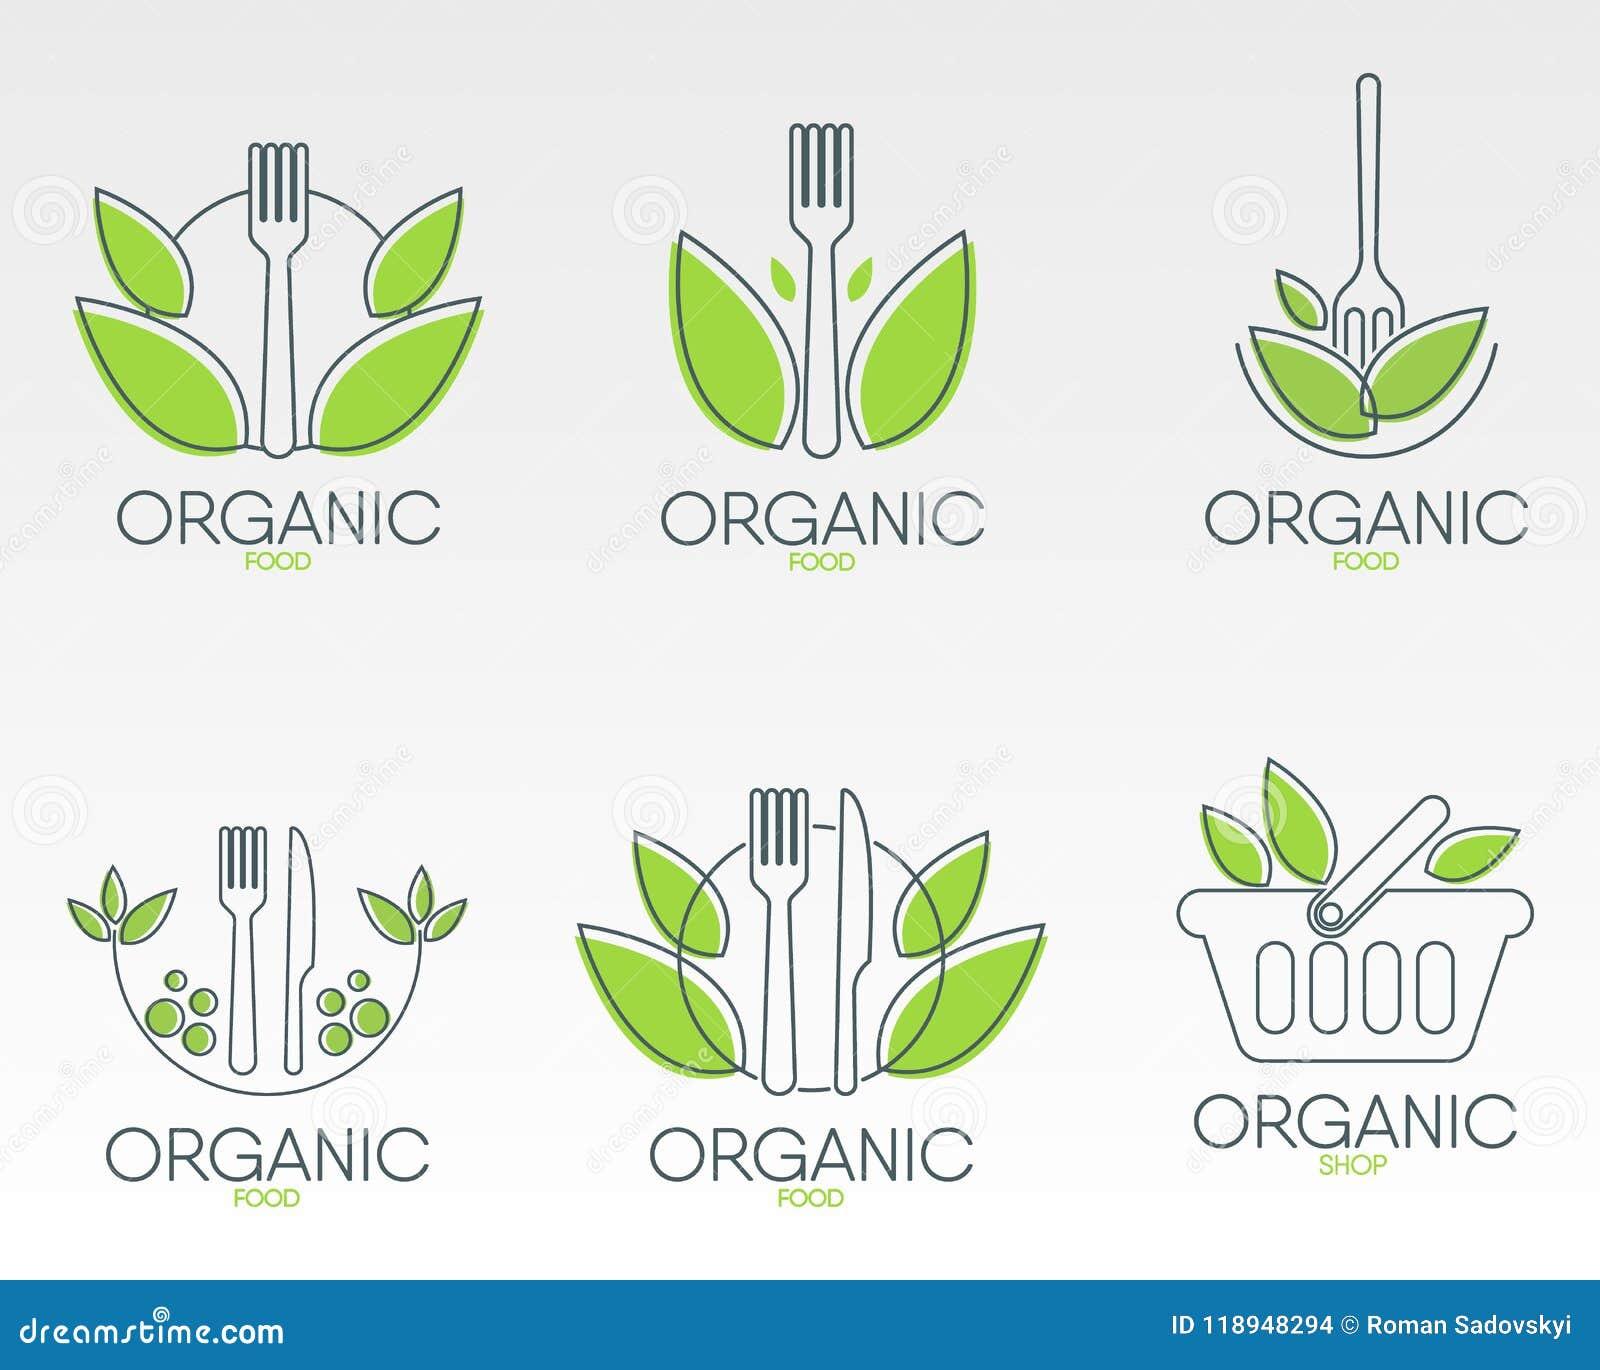 Organic Food Logos Set  Healthy Food Icon  Stock Vector